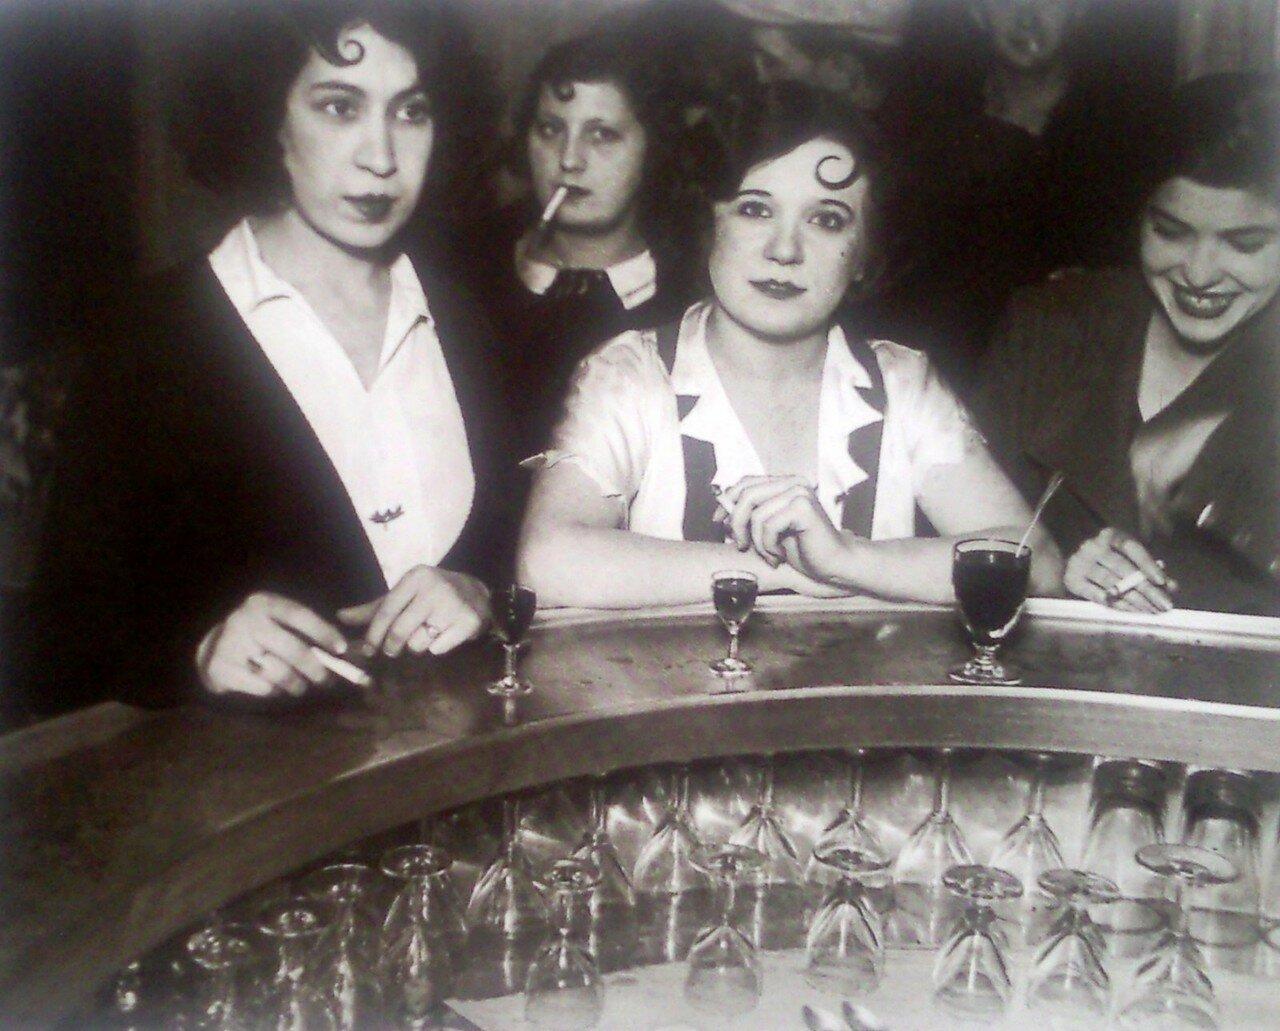 1932. Бар «Л'Аккрoш Кёр» на рю де Лаппе